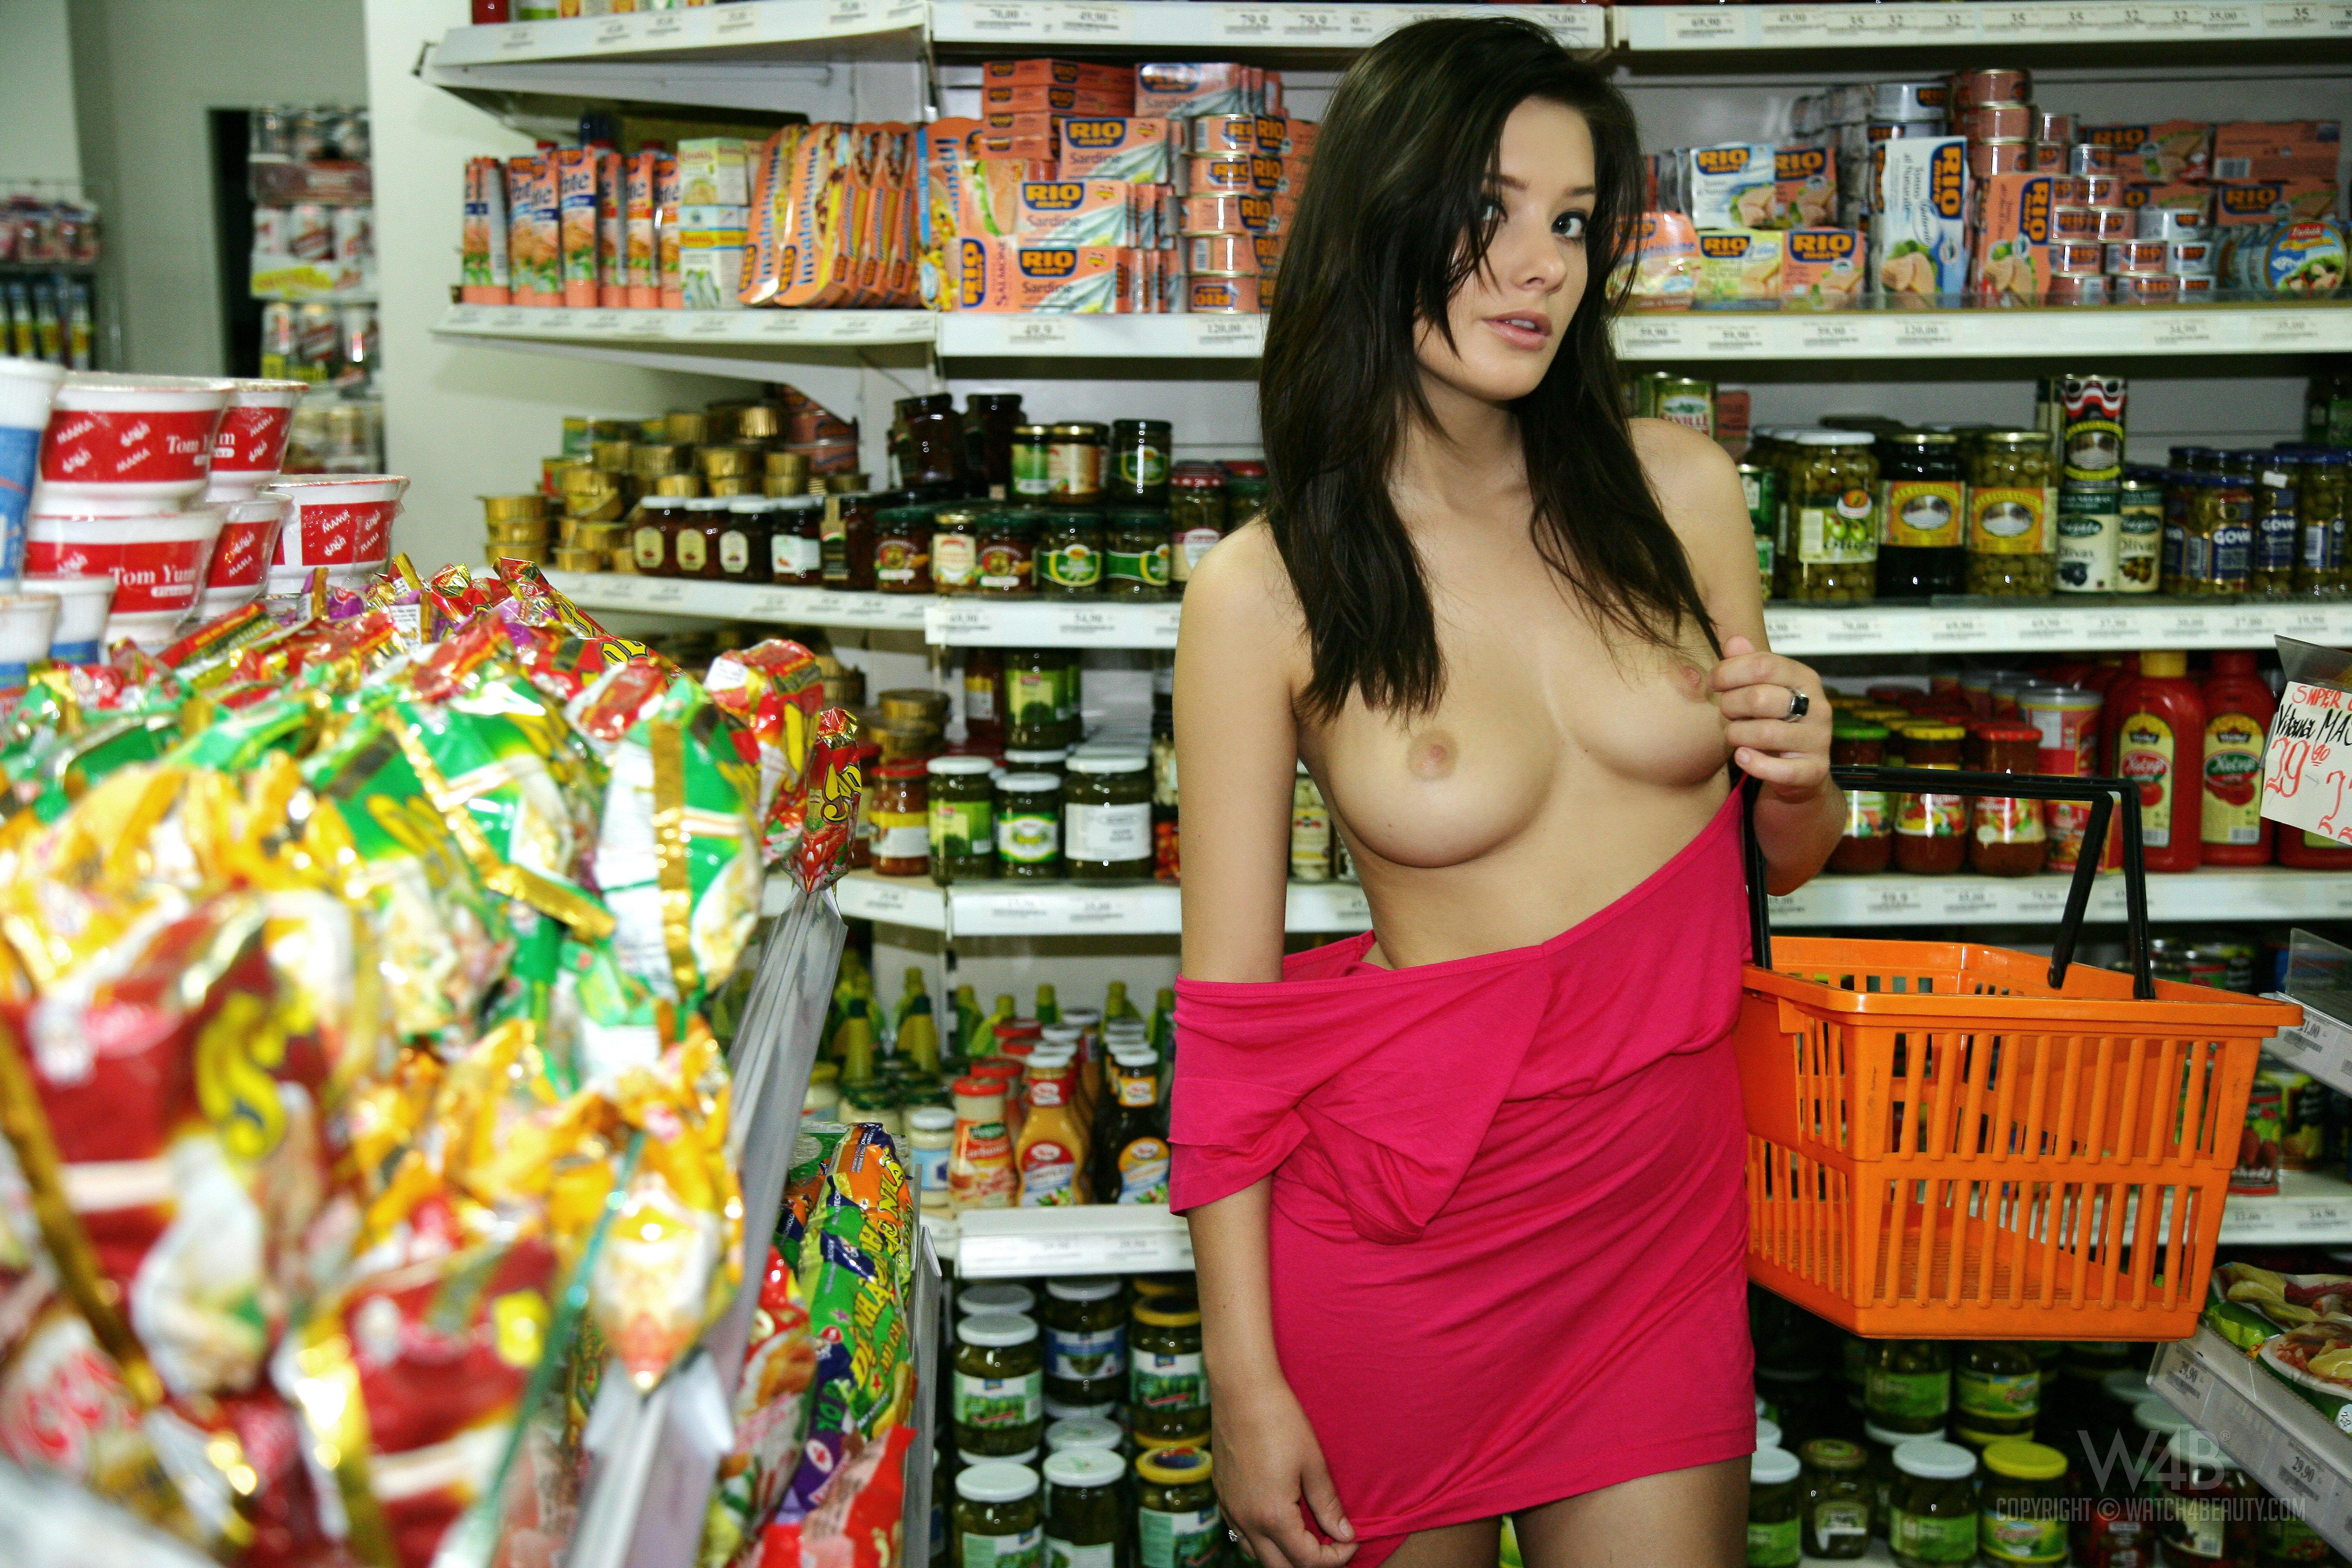 girls-nude-in-a-shop-debra-wilson-nude-pics